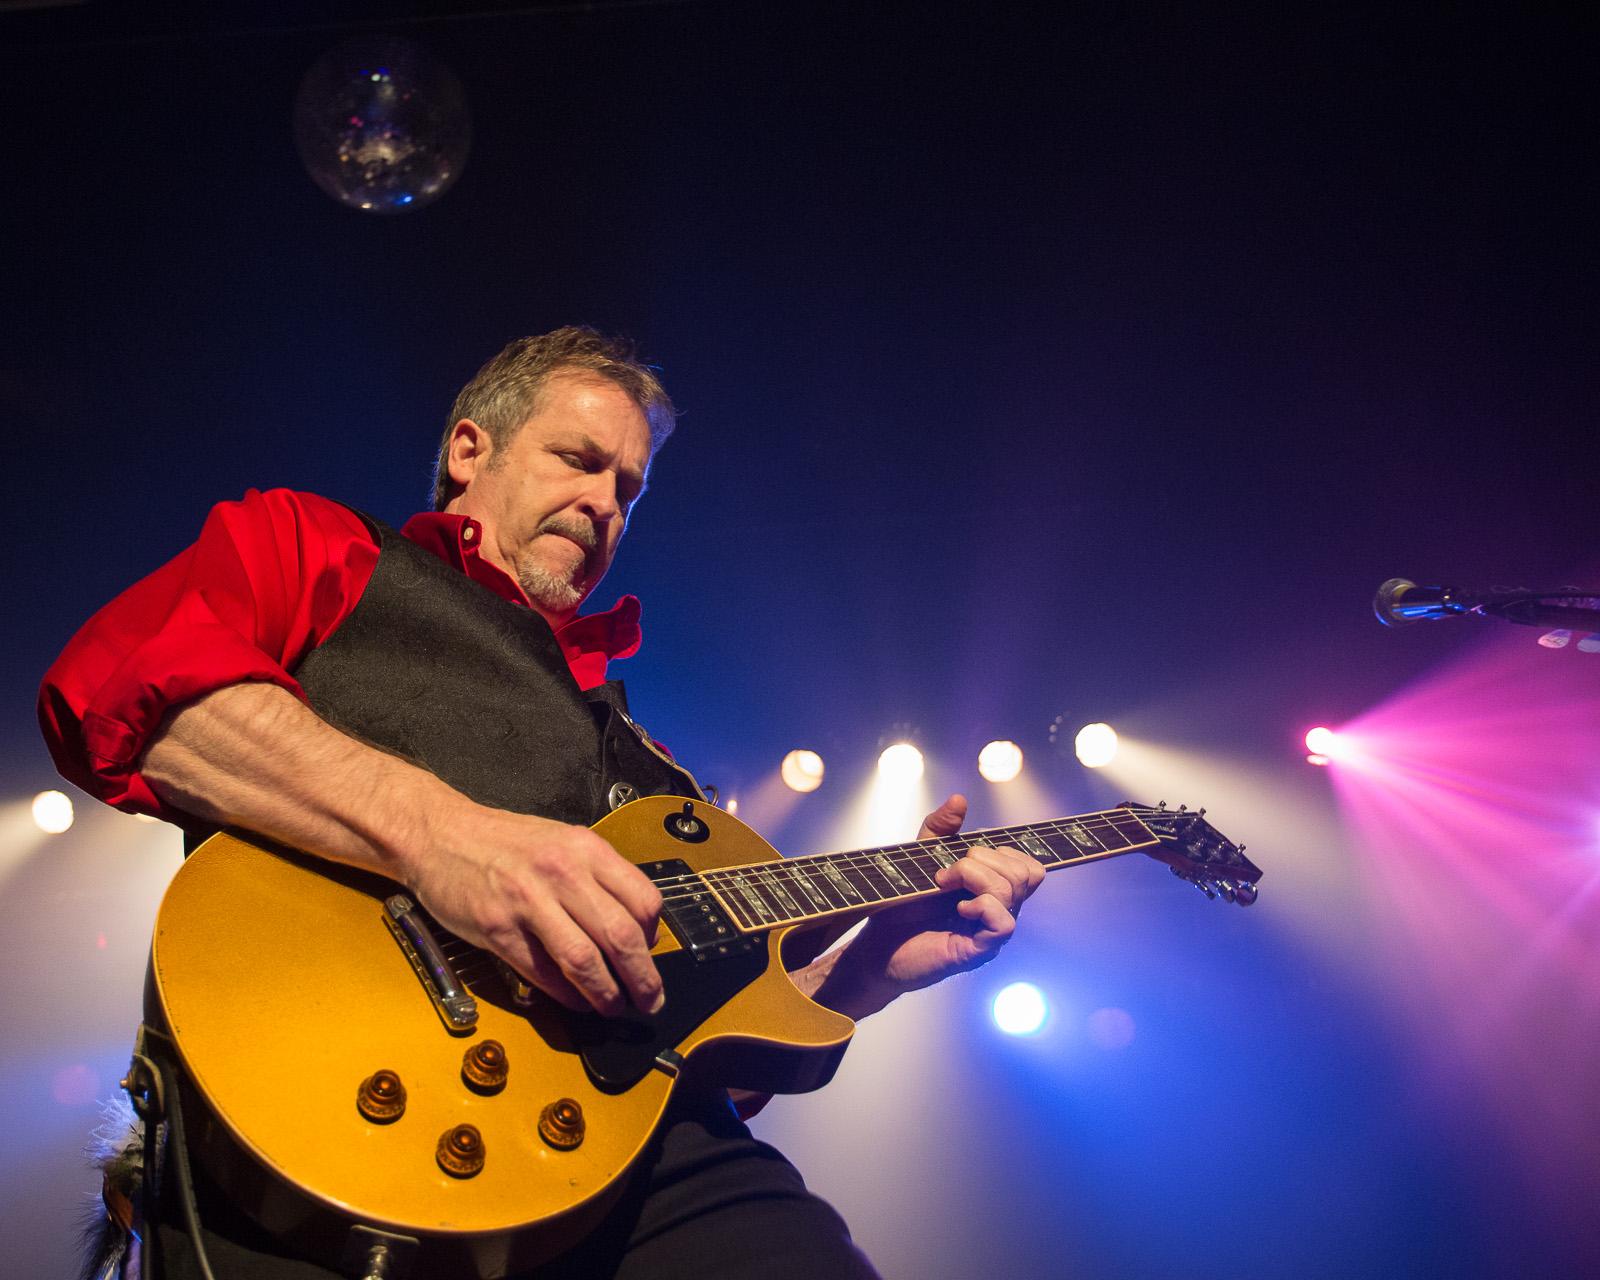 Driver Band guitarist Frankie Winn